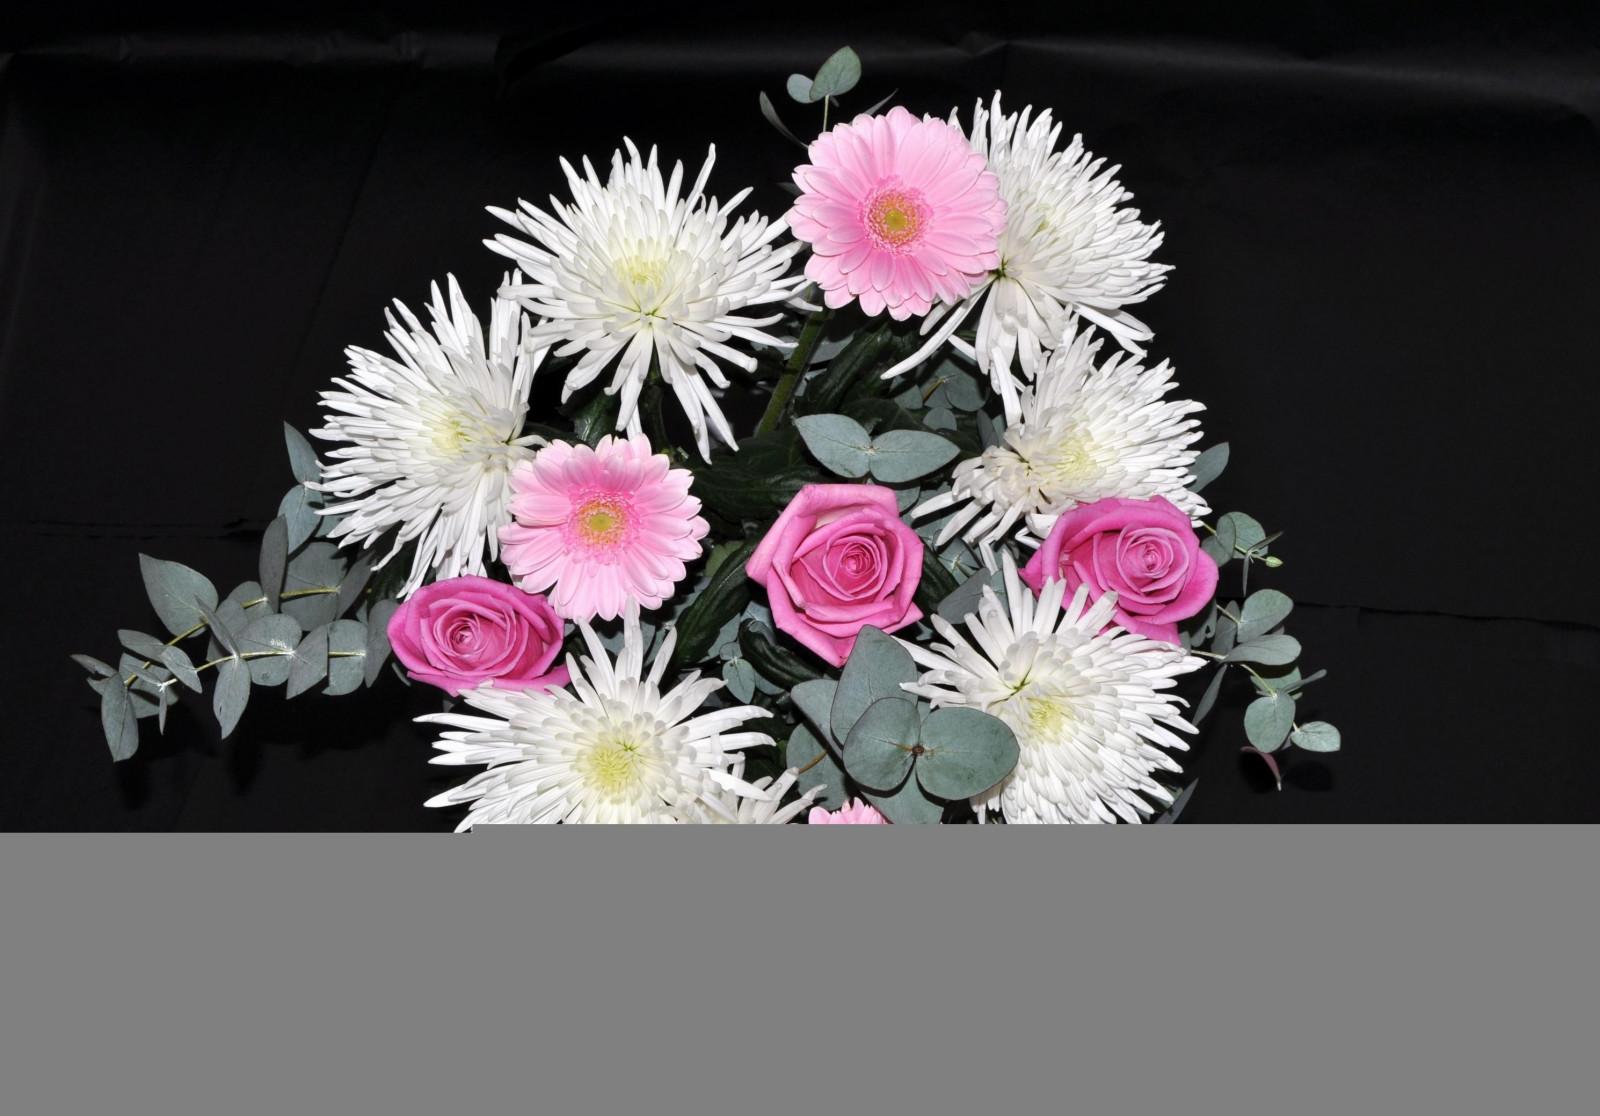 Afskårne Roser baggrunde : sort baggrund, lyserød, krysantemum, blomst, flora